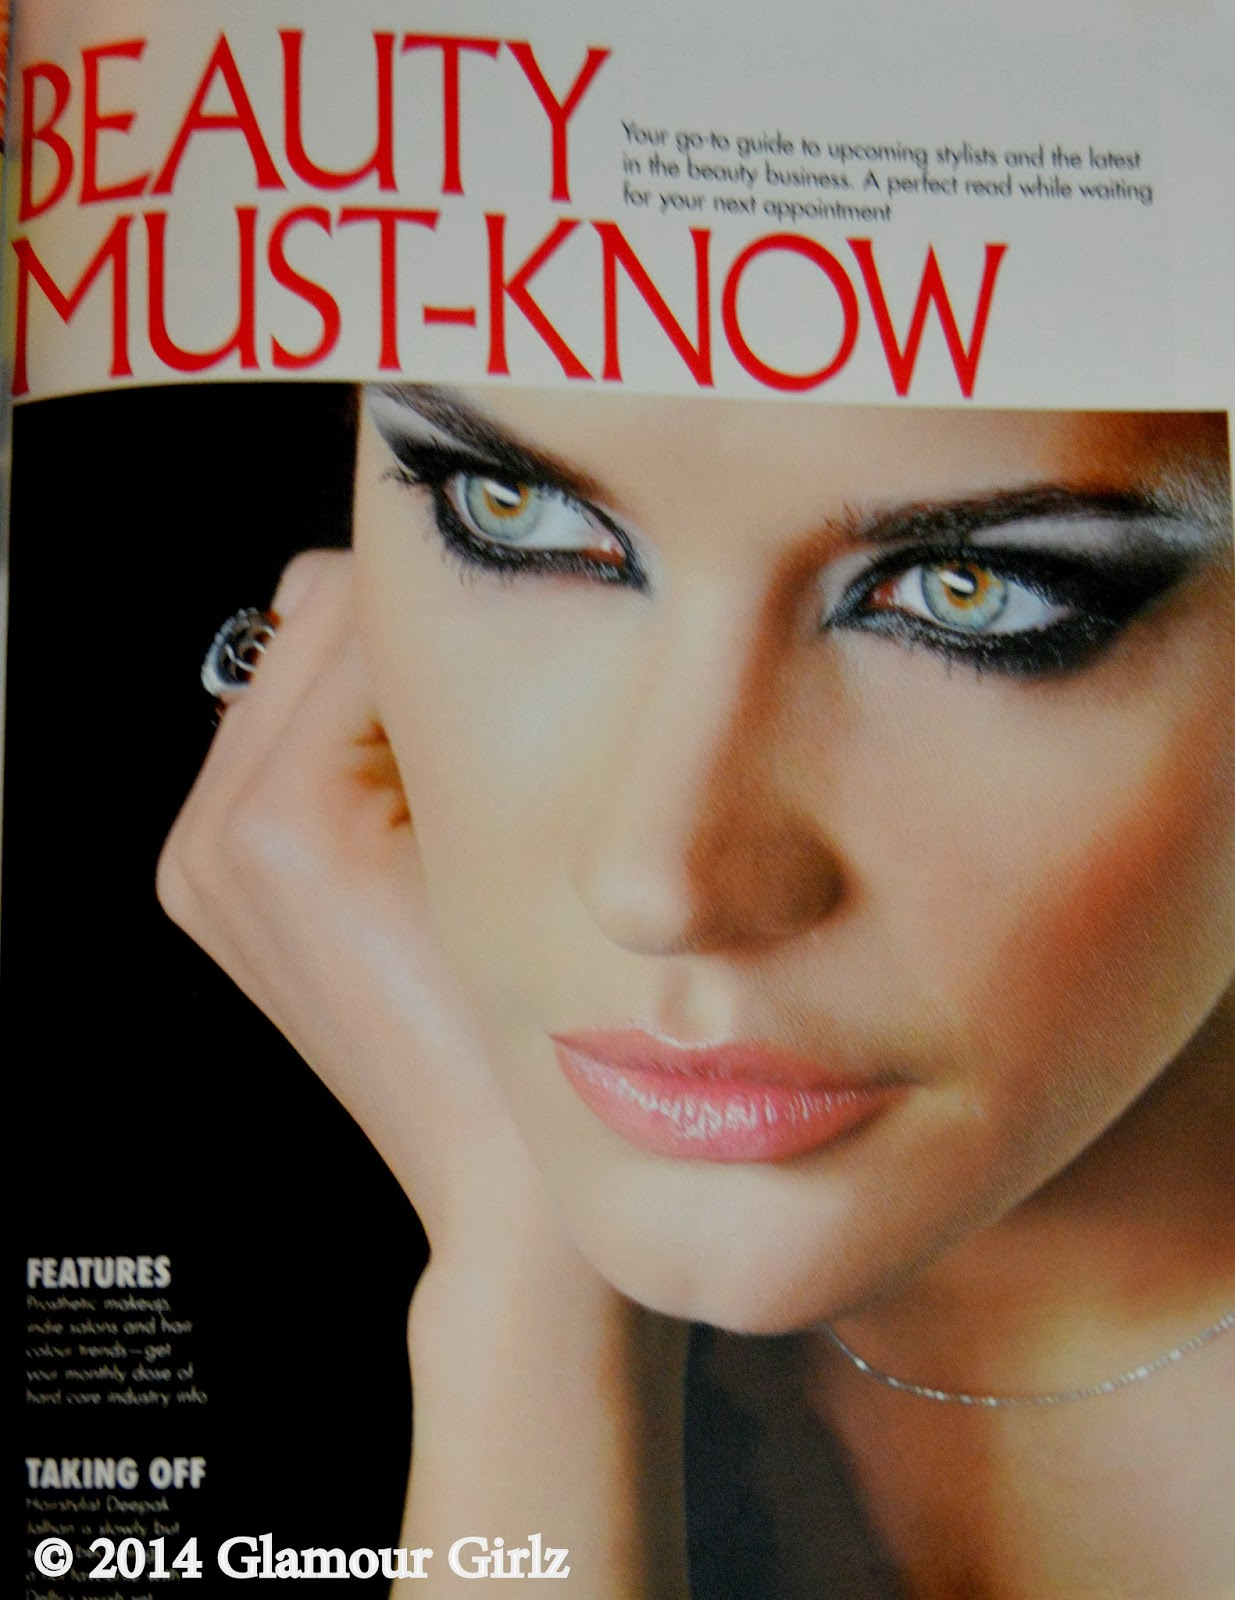 Beauty must know:Femina Salon & Spa